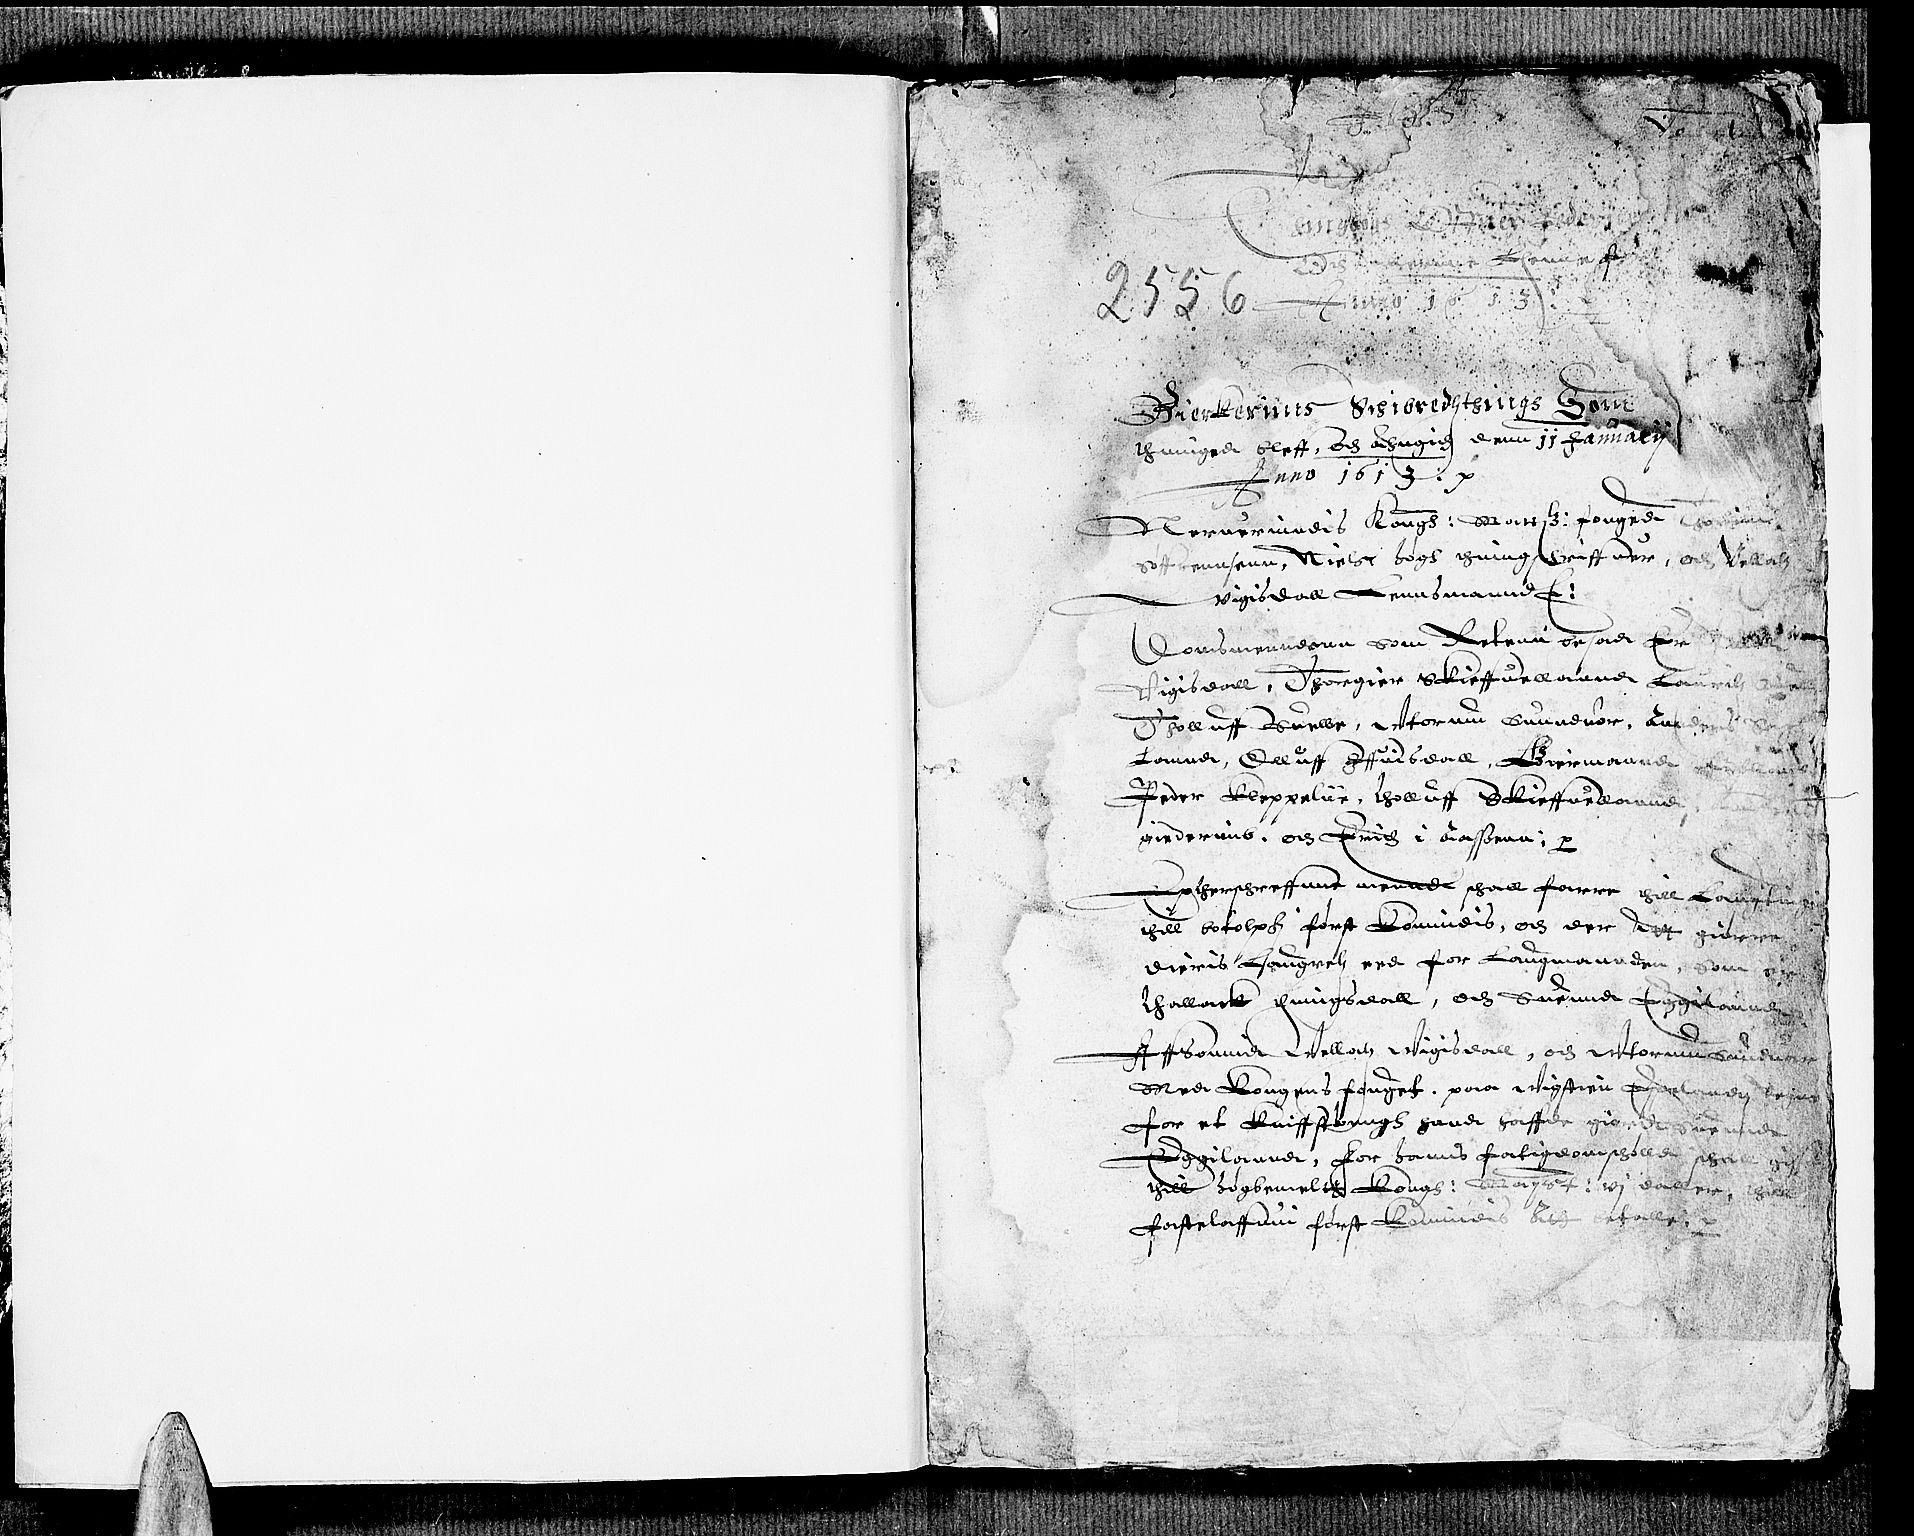 SAST, Jæren og Dalane sorenskriveri, 3/30/30BA/L0001: TINGBOK, 1613, s. 0b-1a